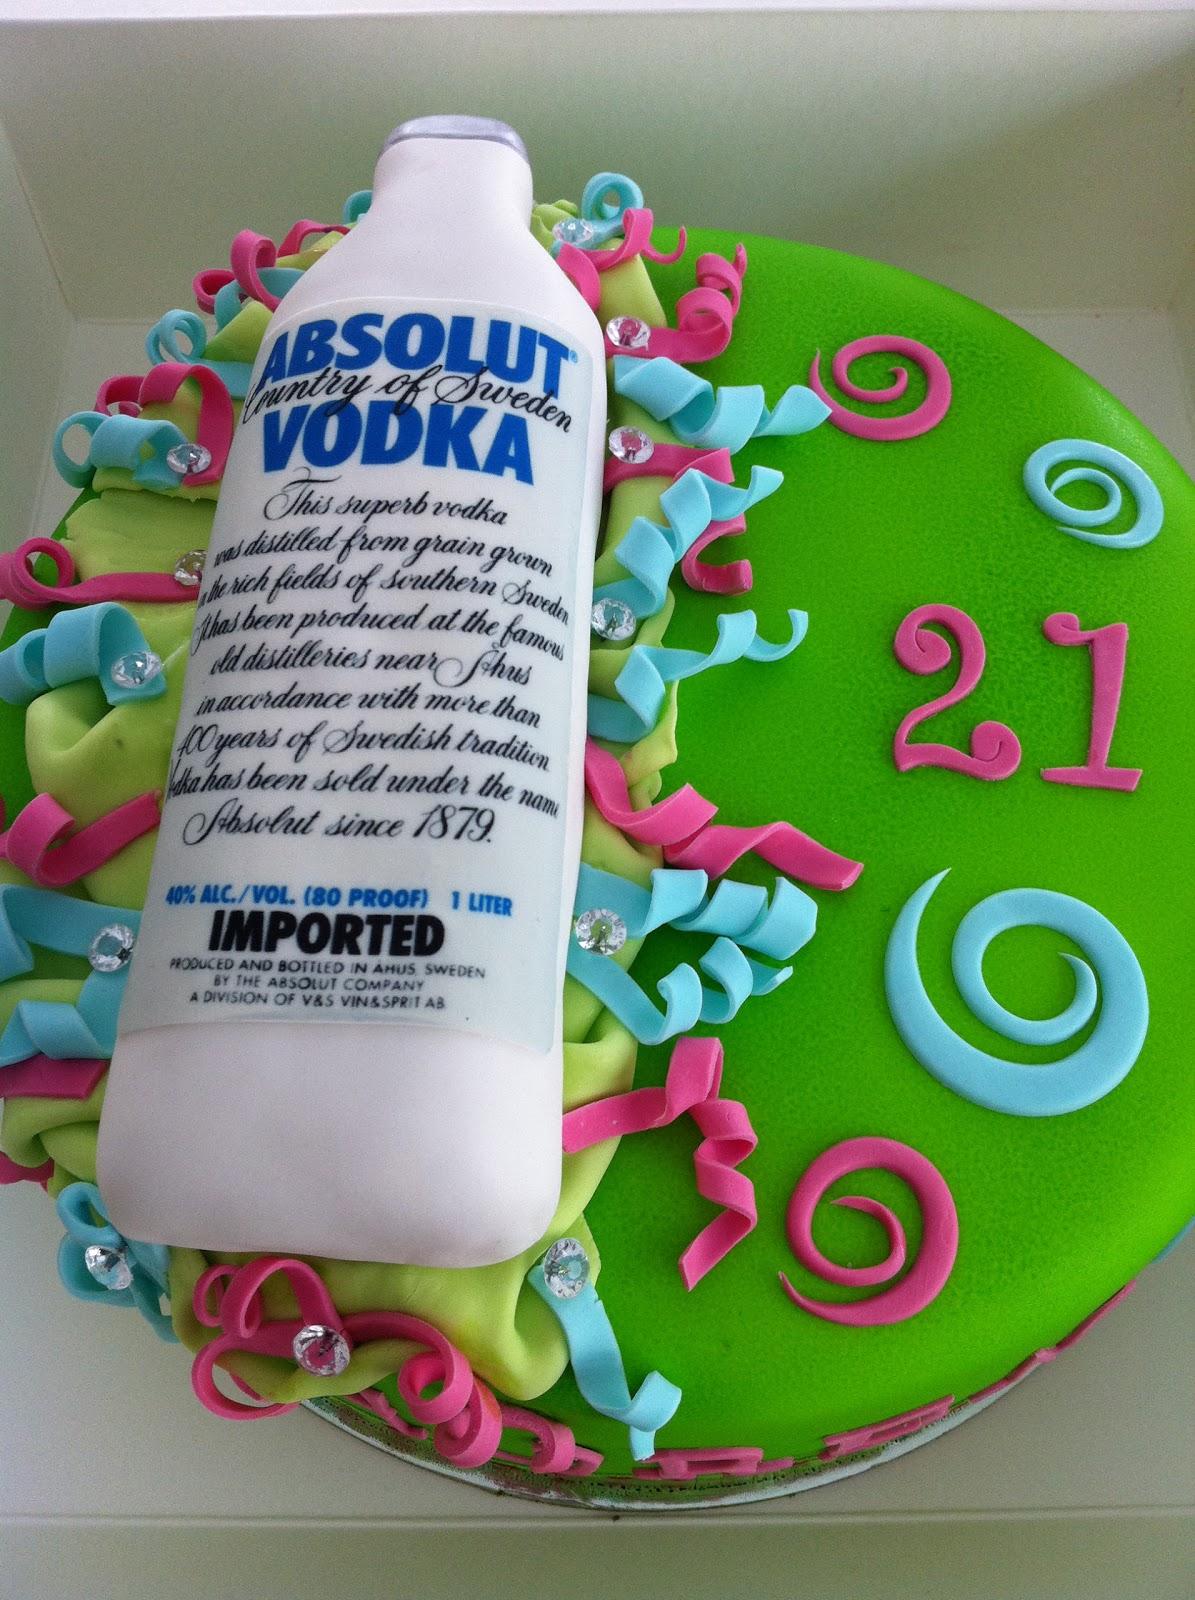 Mandylicious Cakes: Absolut delicious